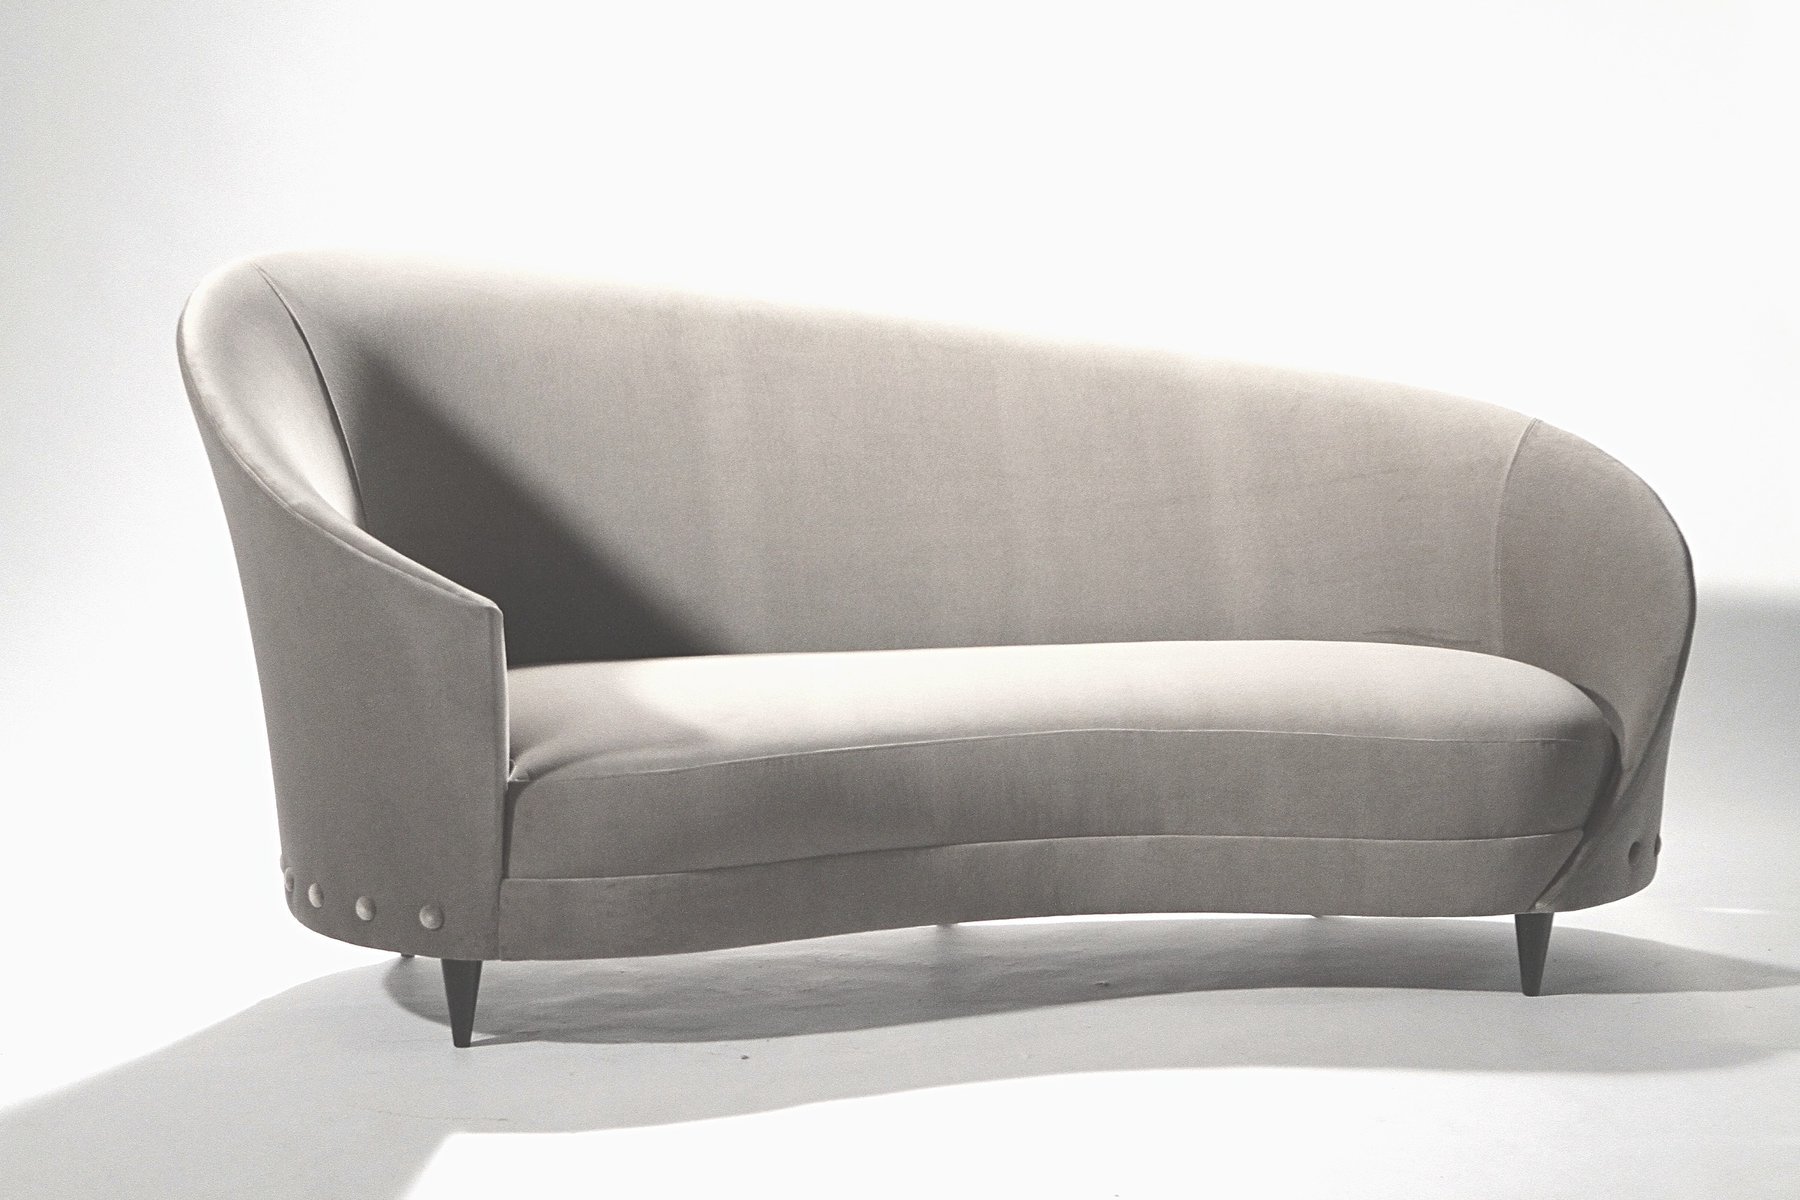 Italian Meridian Sofa, 1960s for sale at Pamono